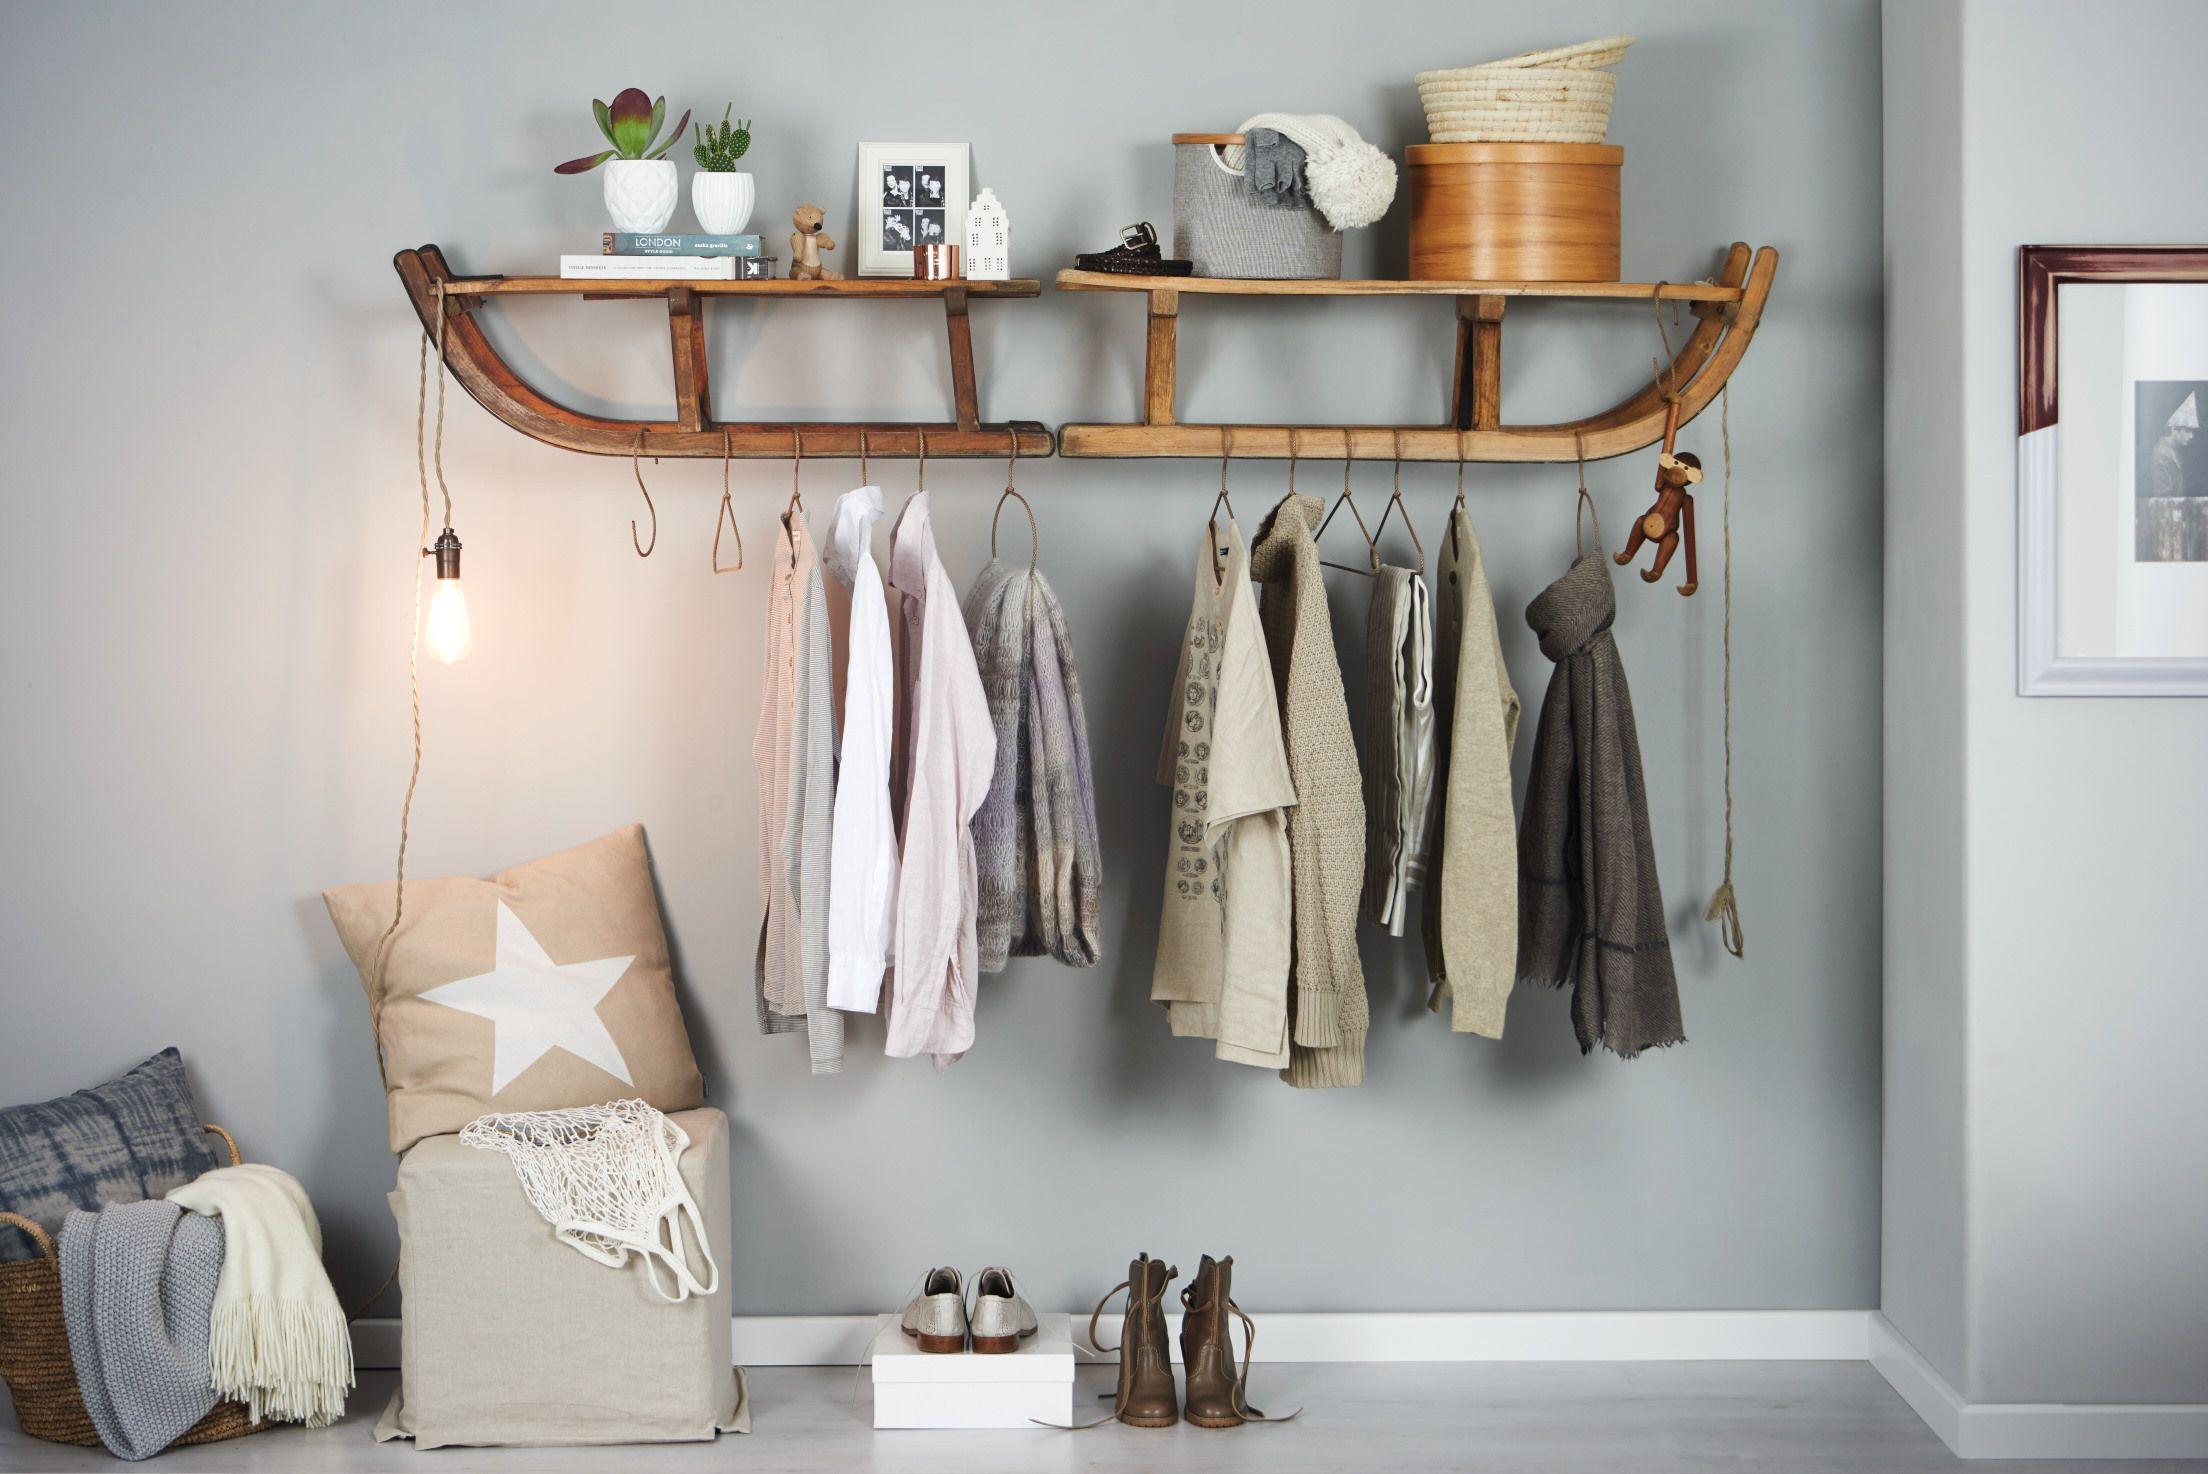 schlitten-garderobe selbst bauen, do-it-yourself-projekt | ideen